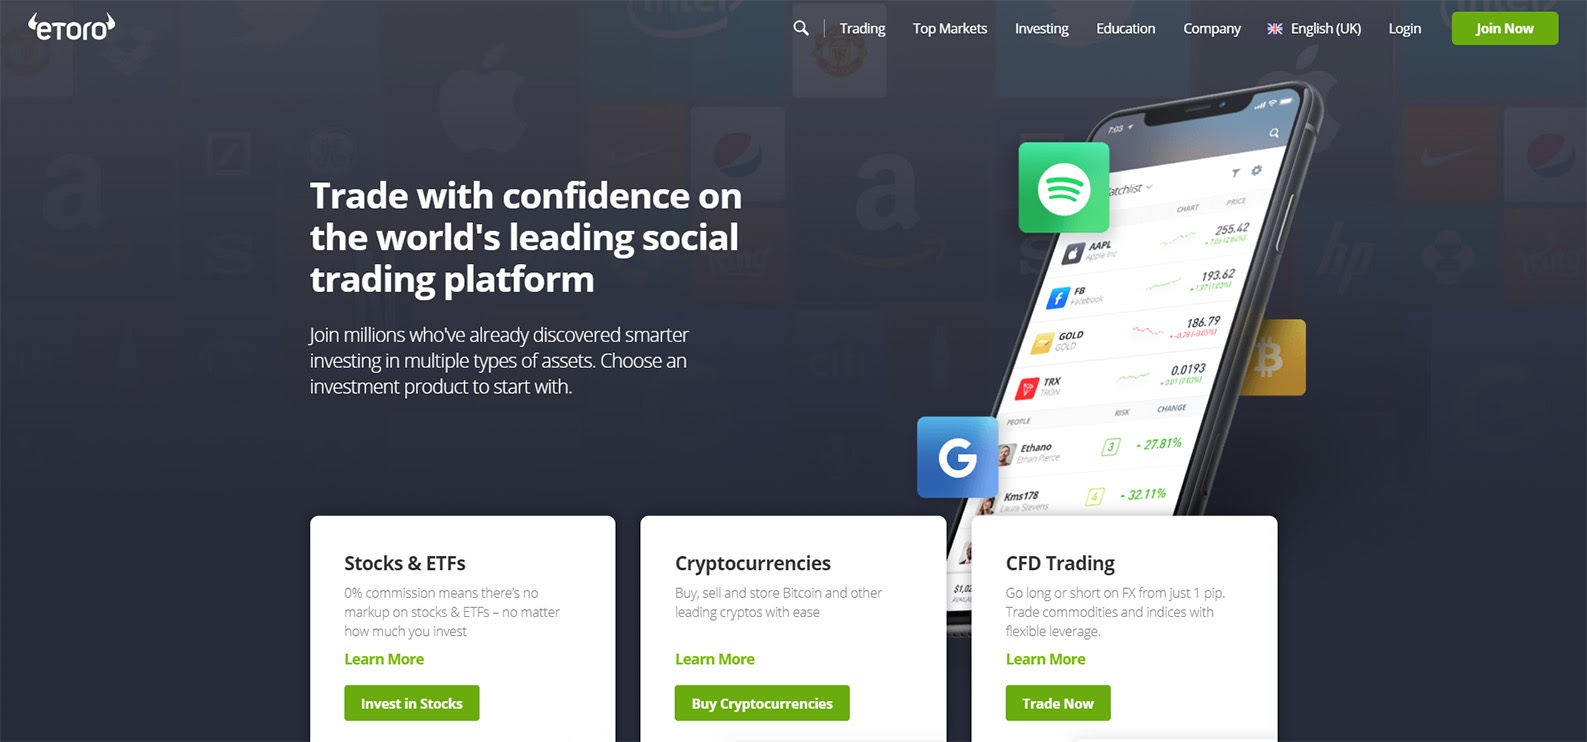 eToro is a multi-asset social trading platform